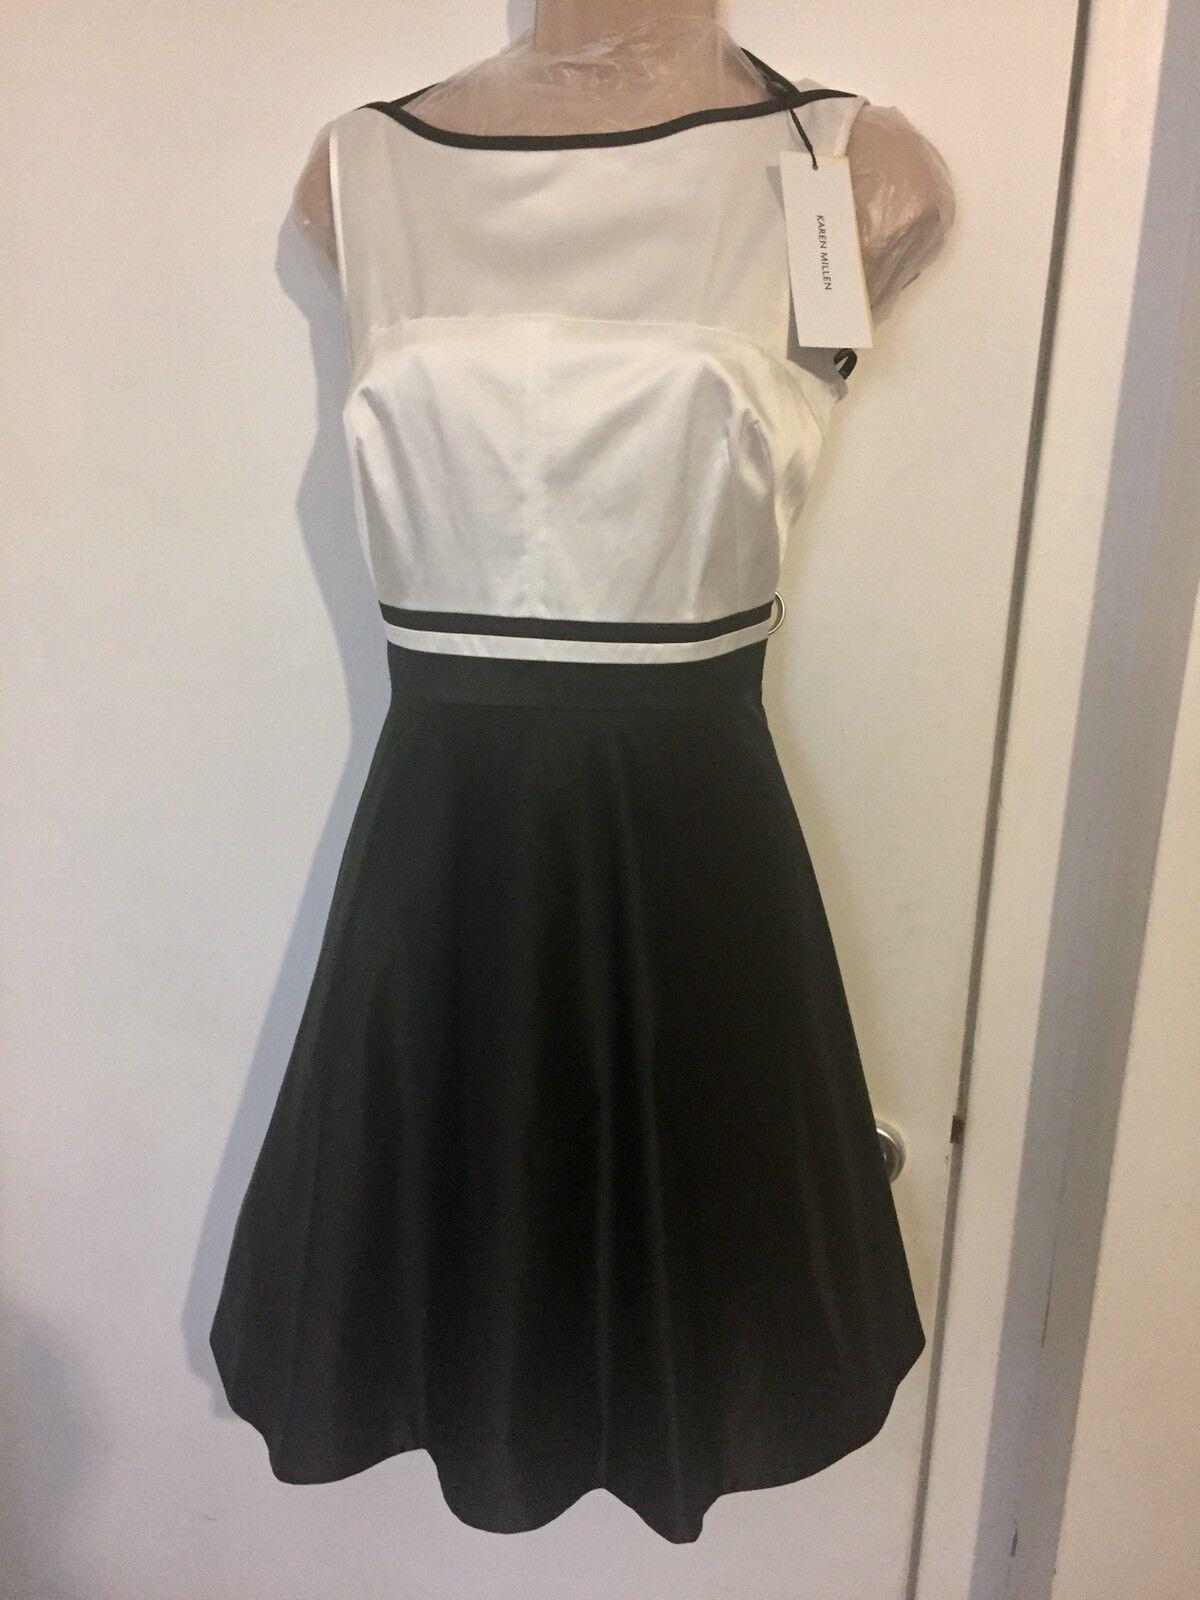 335758aa755 Karen Millen Cocktail Dress Size 12 for sale online   eBay